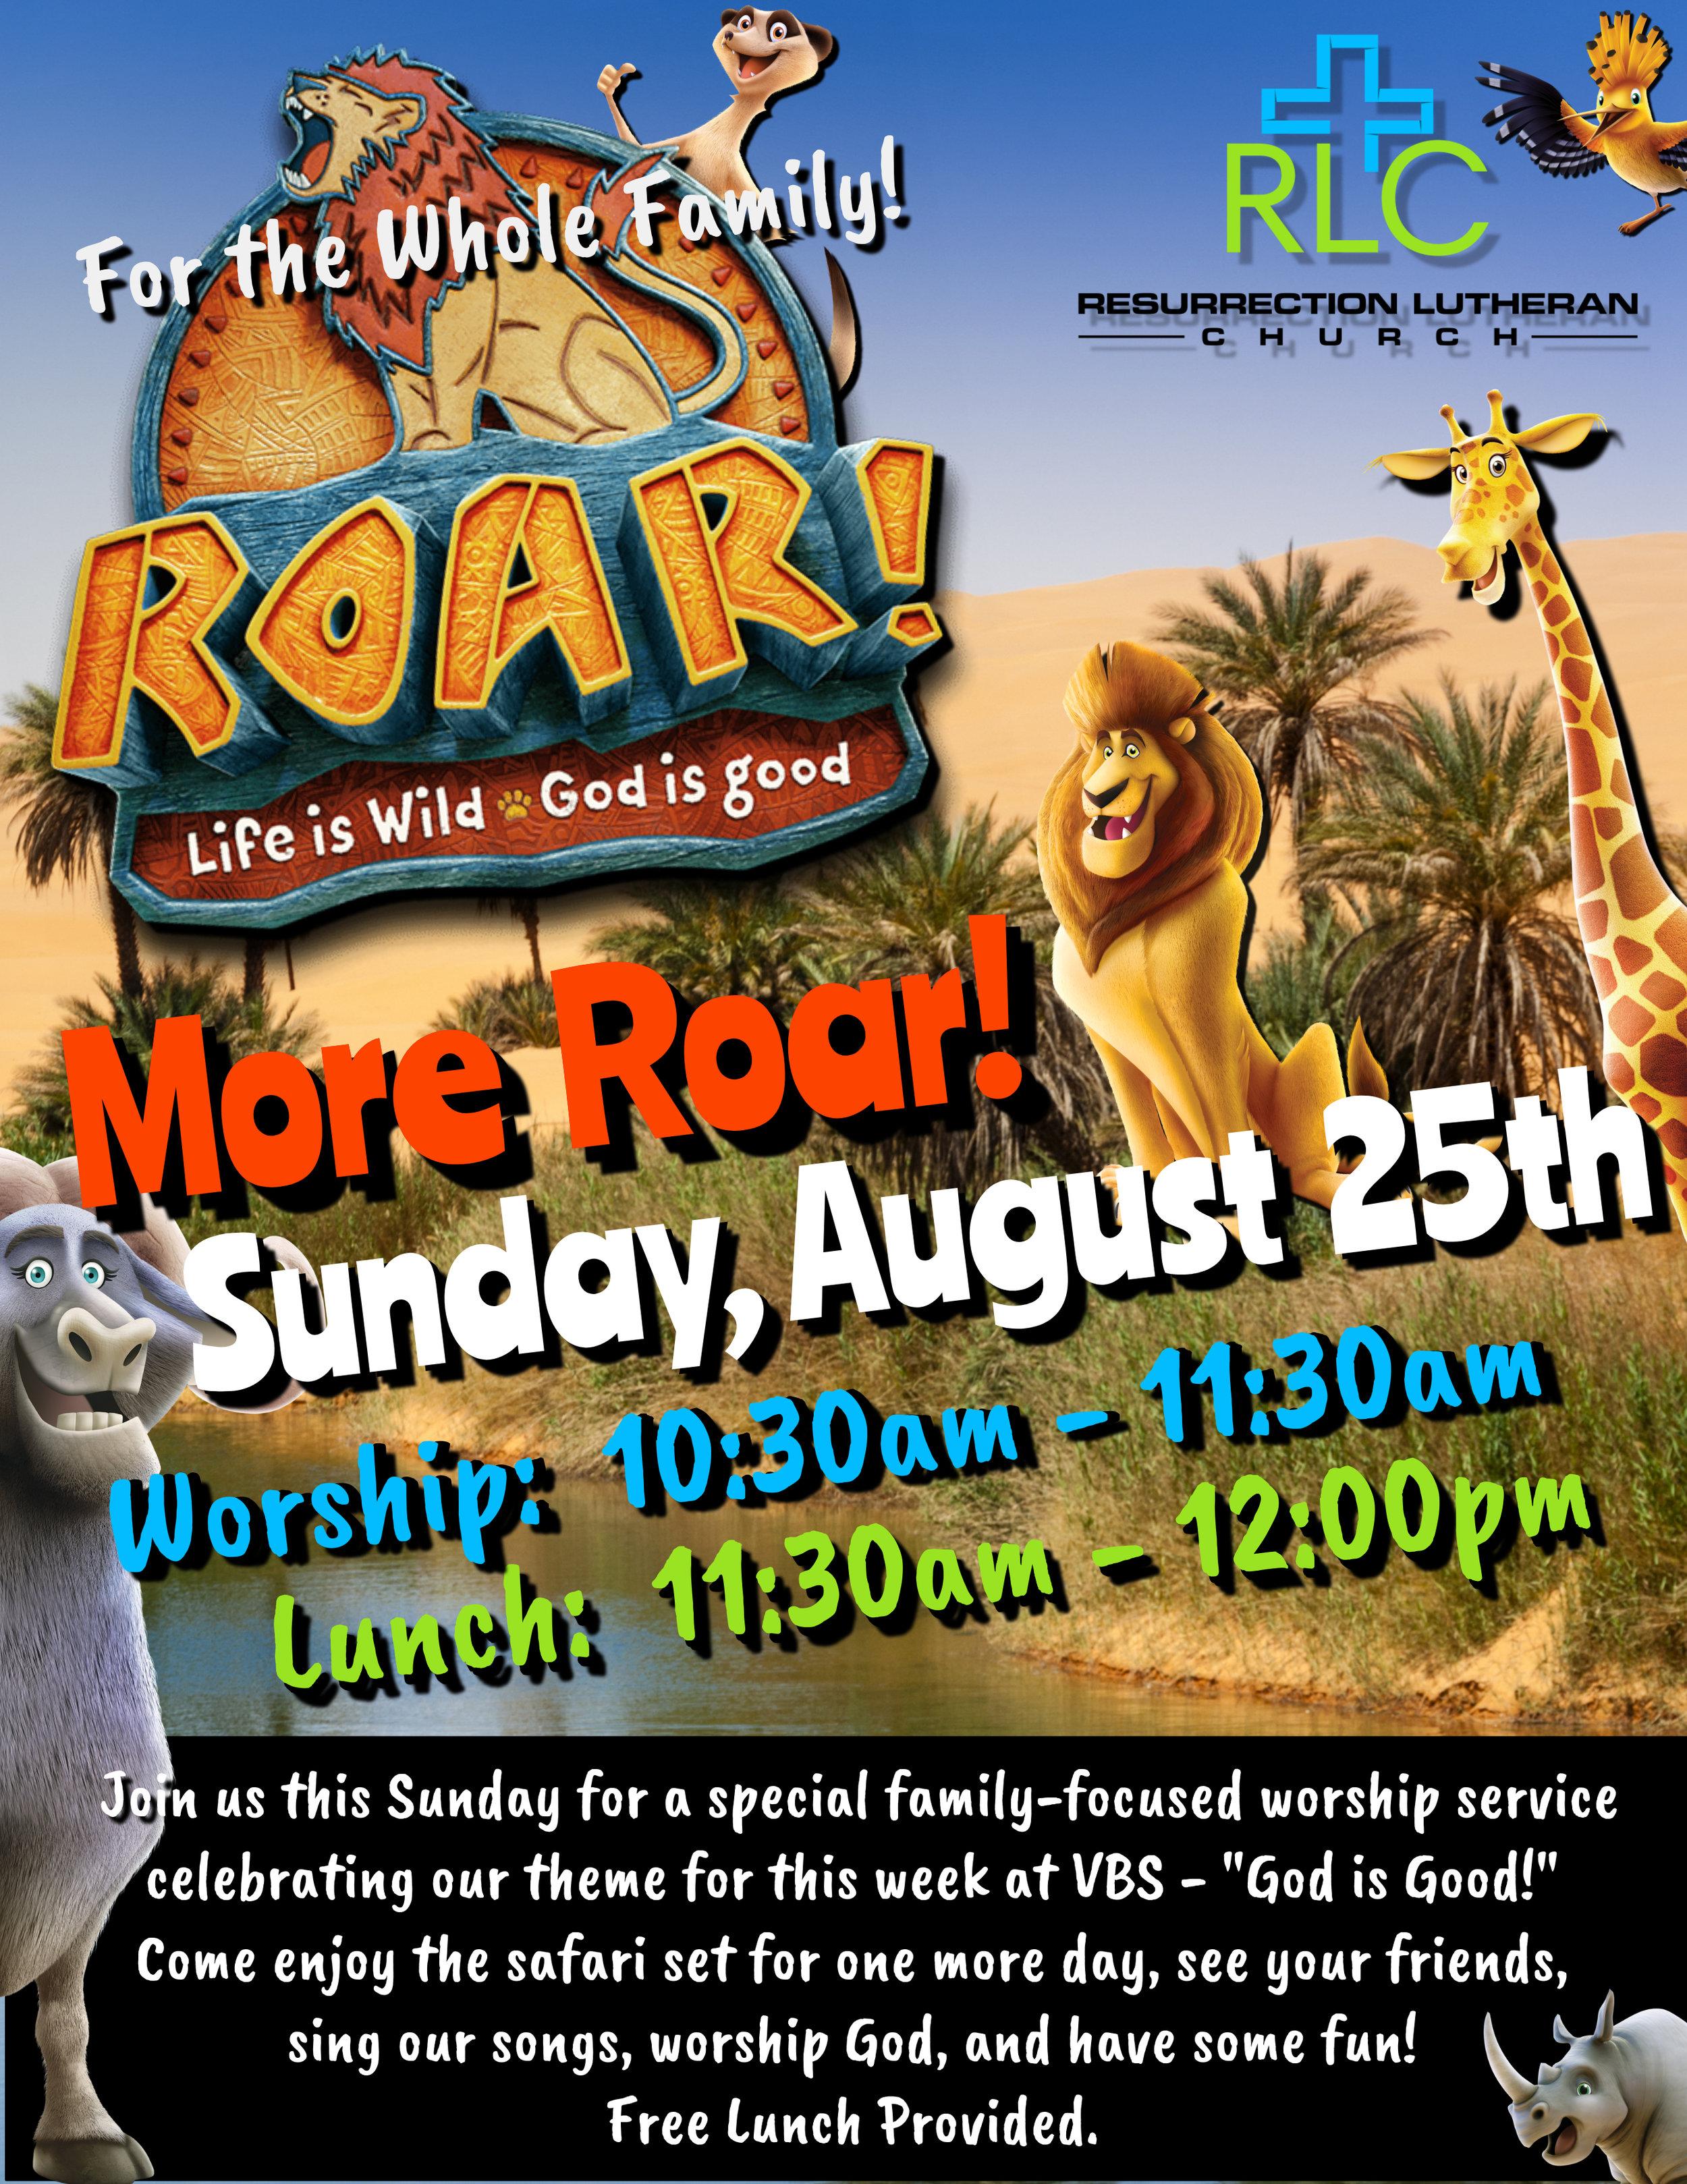 August 25, 2019 - More Roar Sunday : Life is Wild, God is Good!(Rev. Steven Williamson-Link)